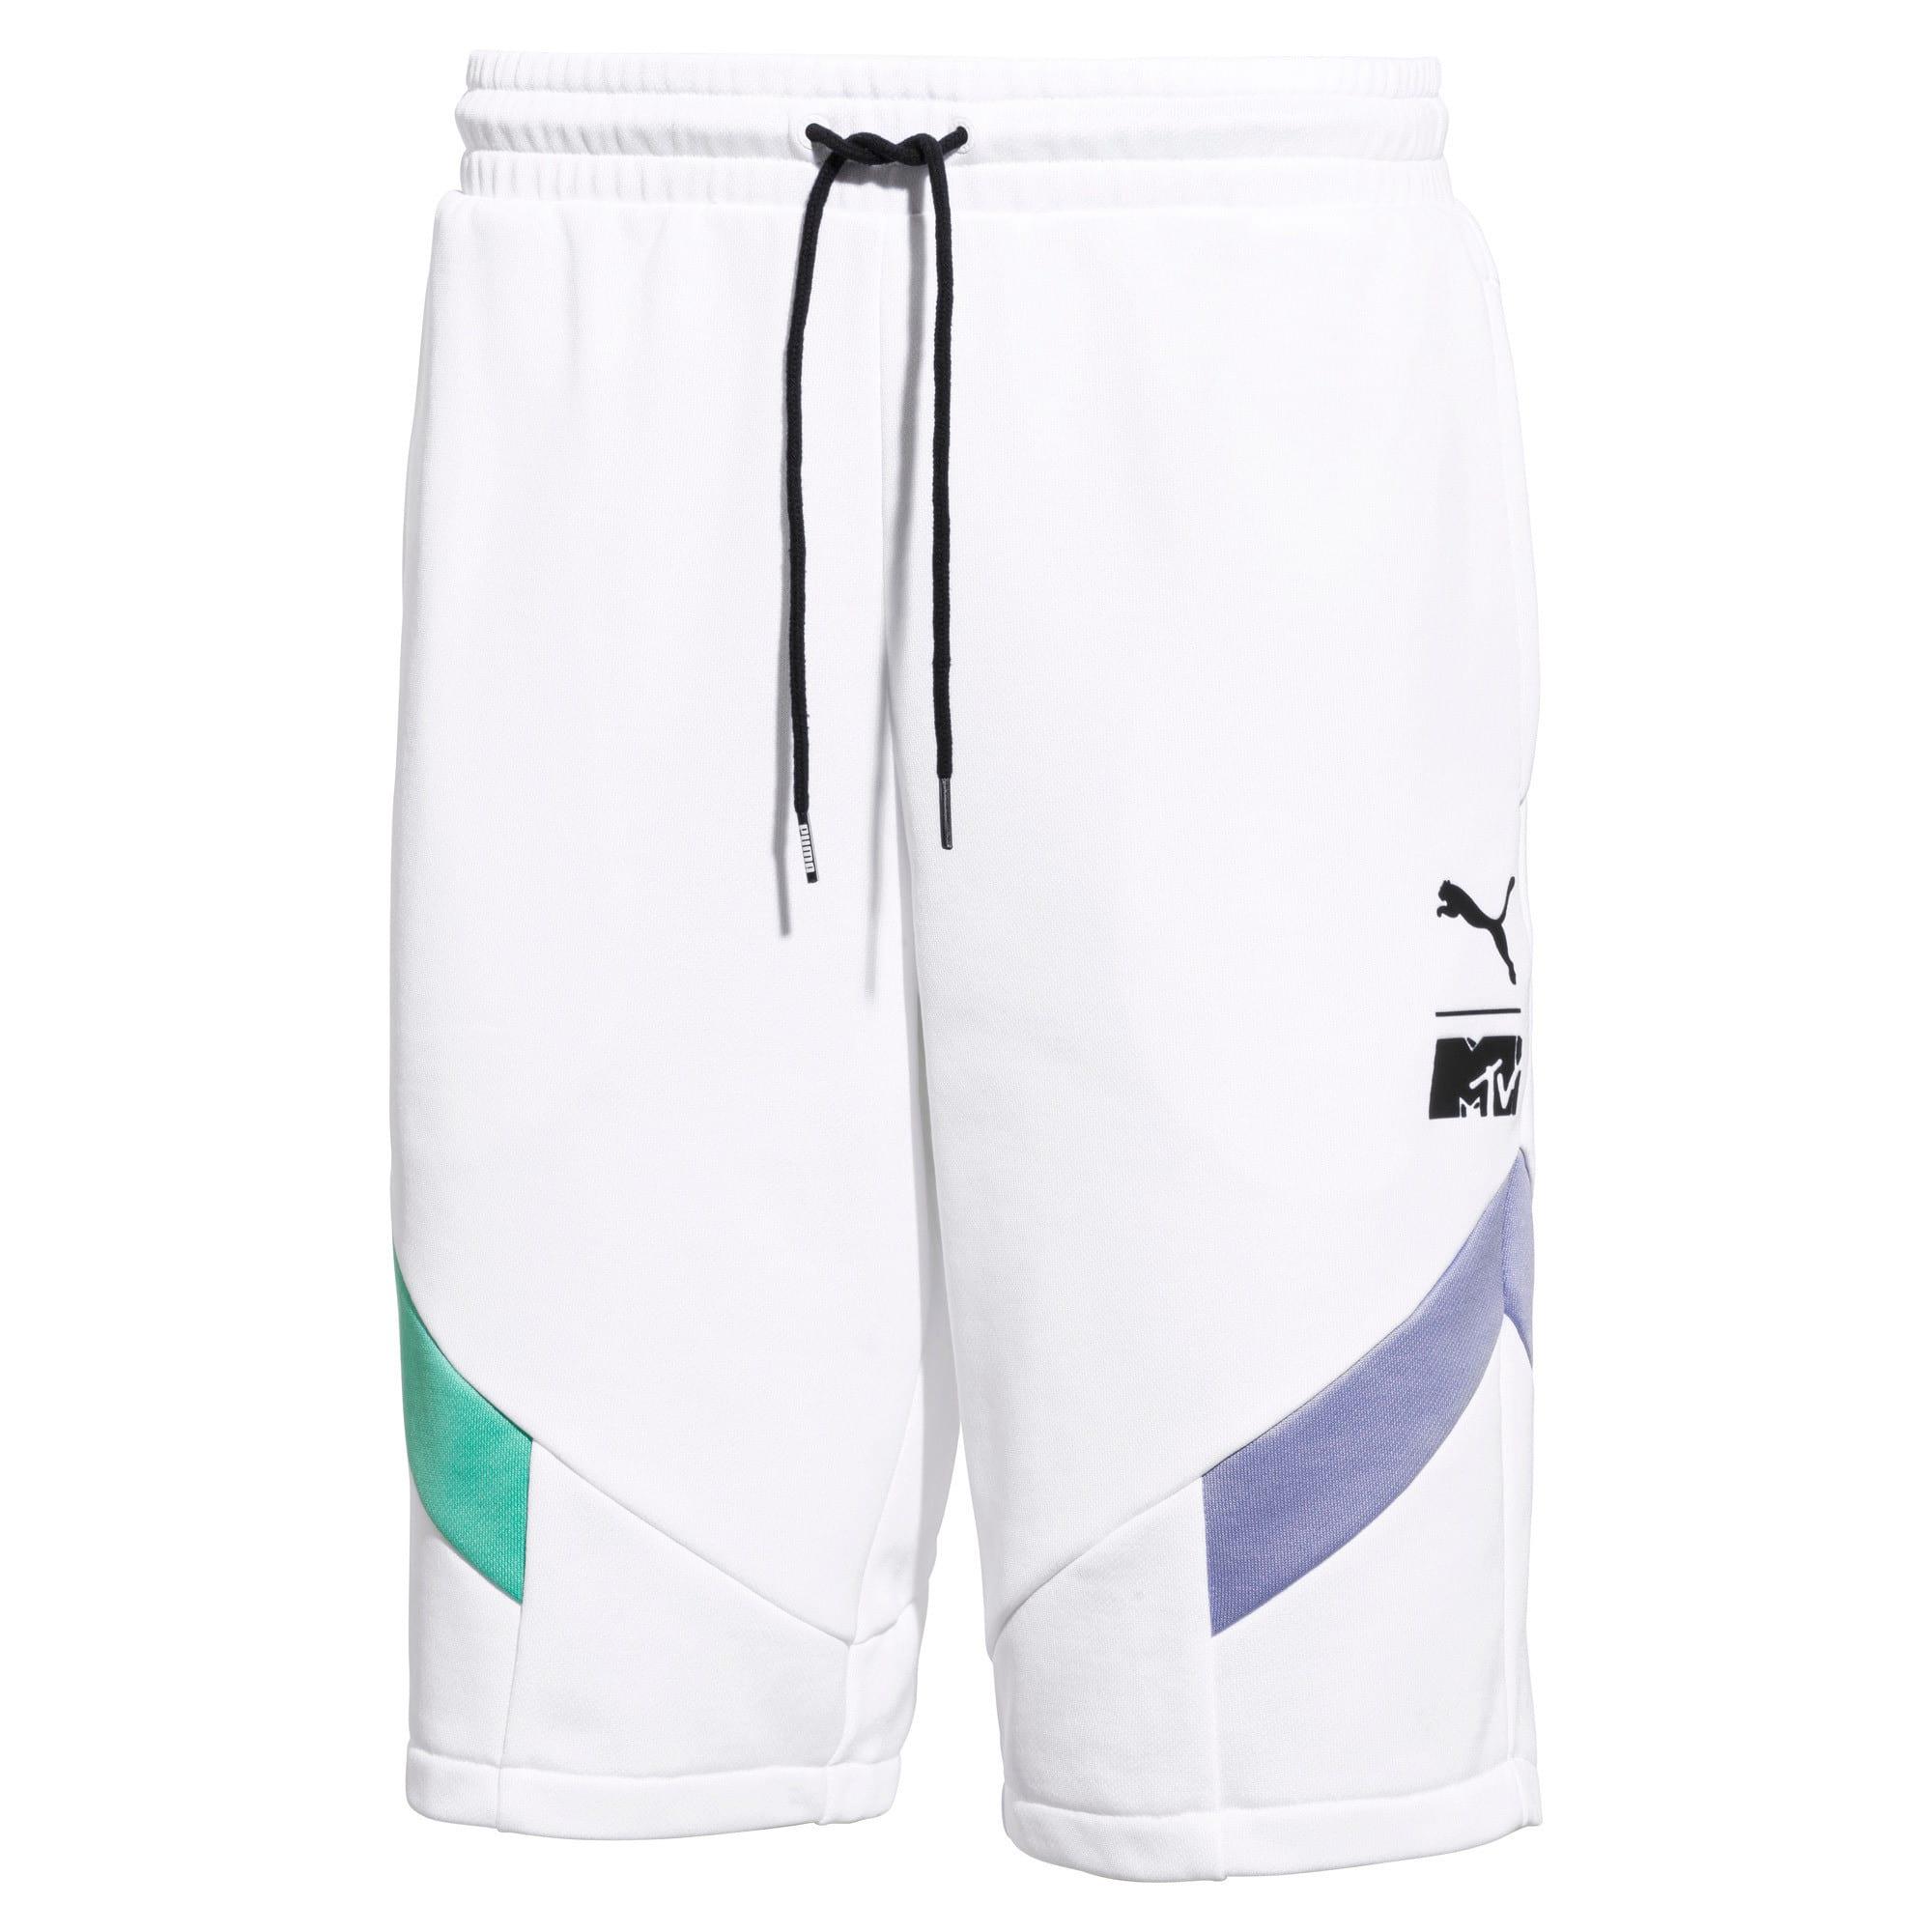 Thumbnail 1 of PUMA x MTV MCS Men's Shorts, Puma White, medium